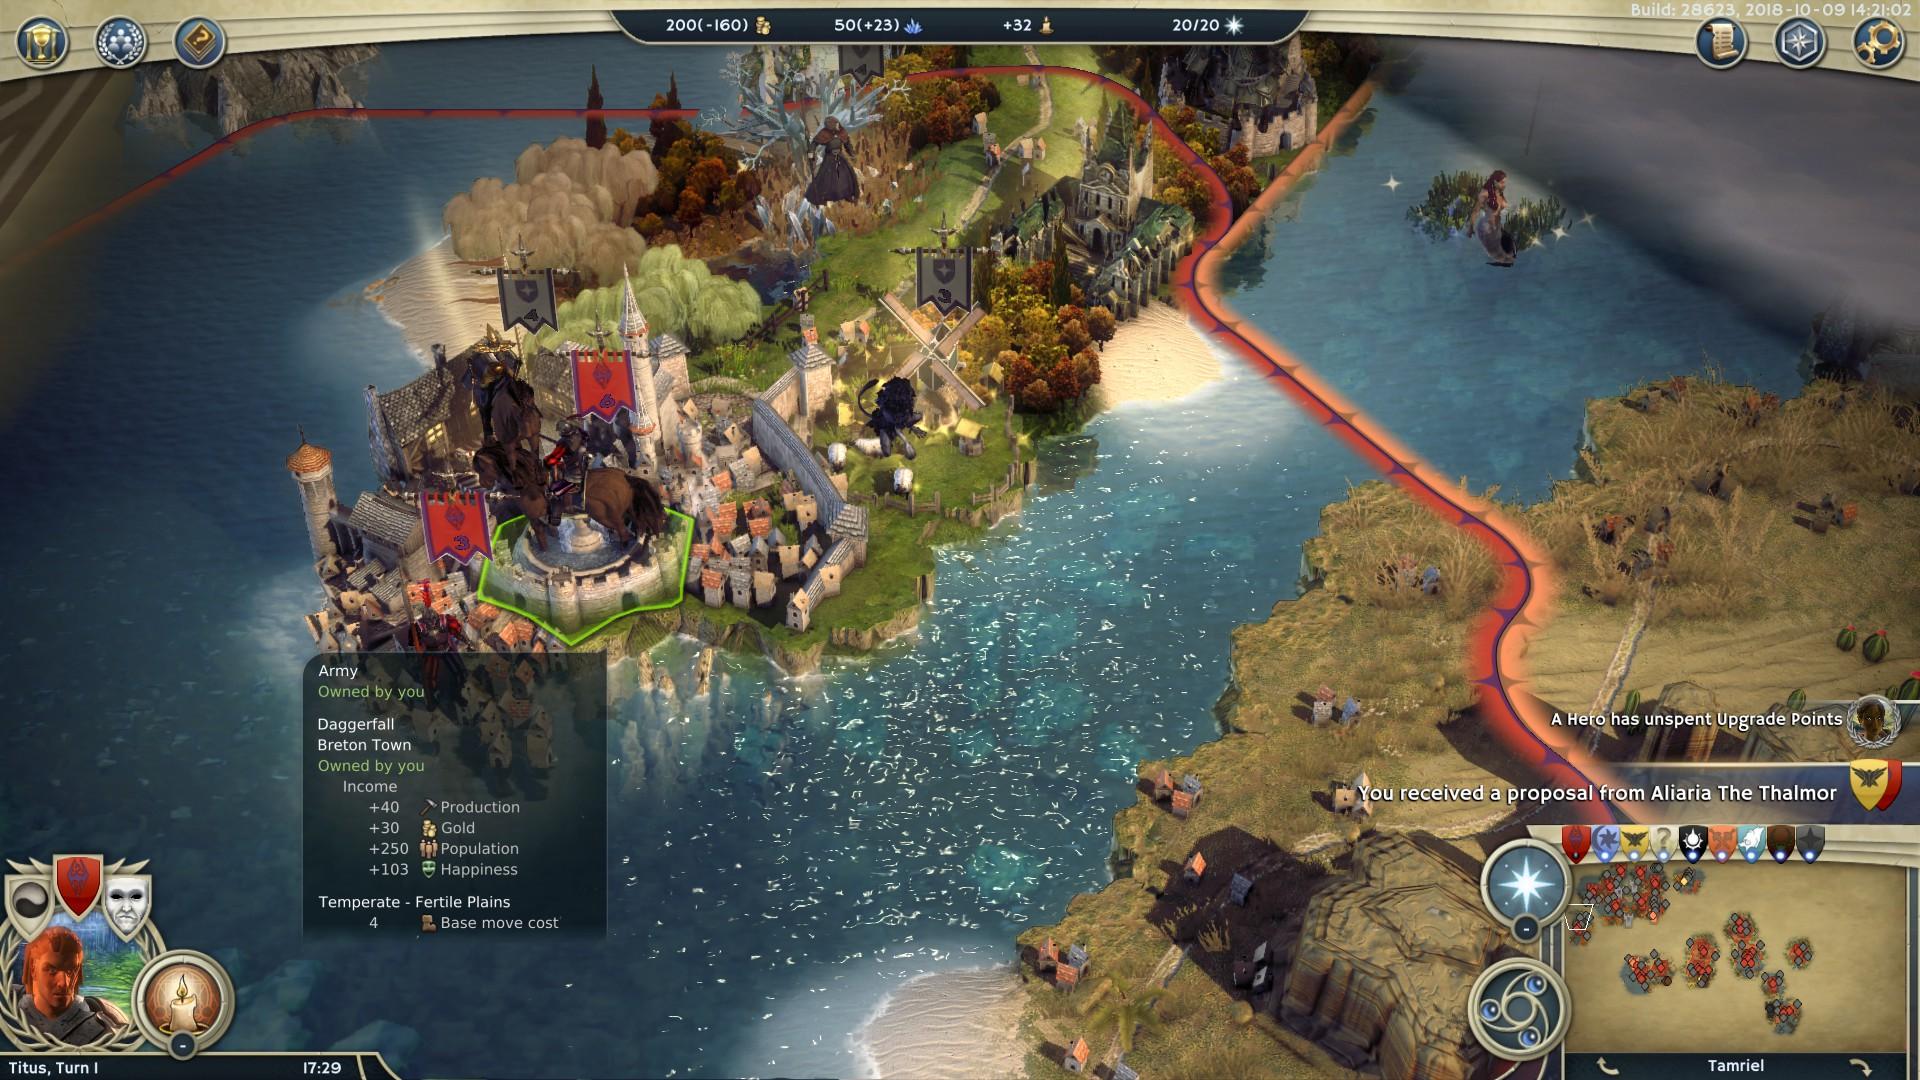 TES Tamriel Project: Age of Tamriel | Paradox Interactive Forums